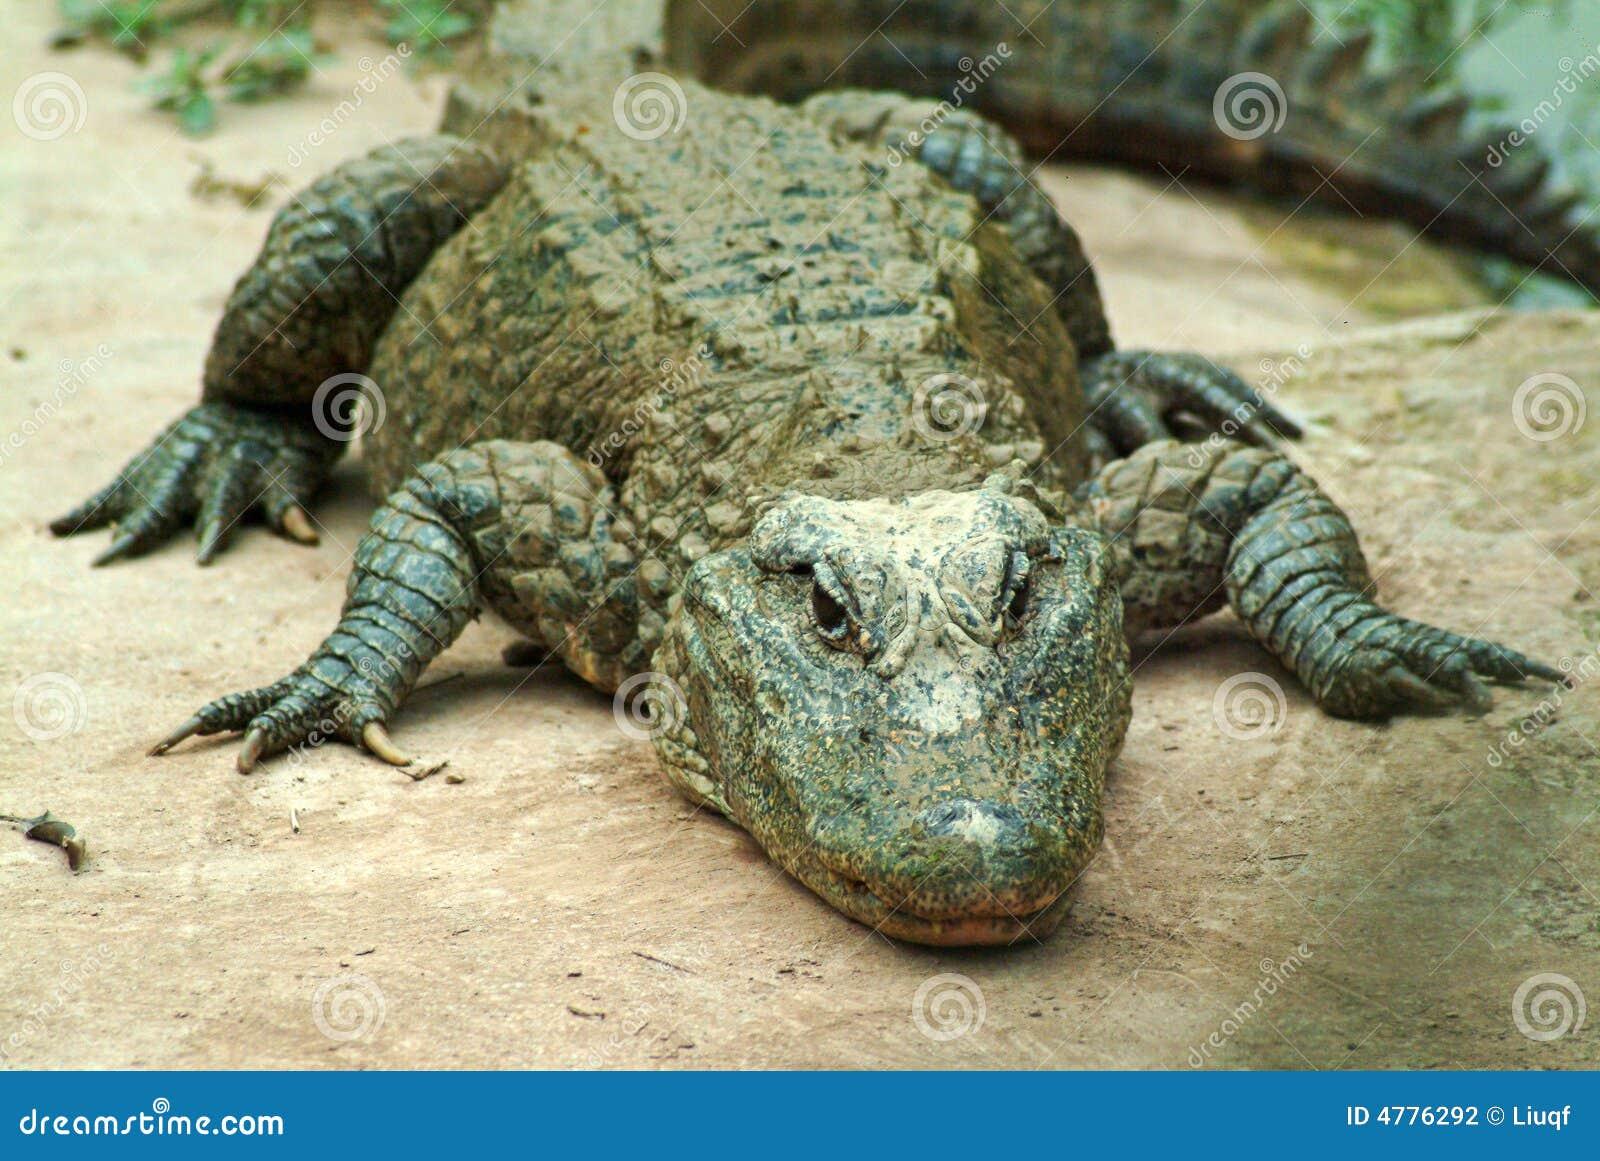 Alligatorsinensis